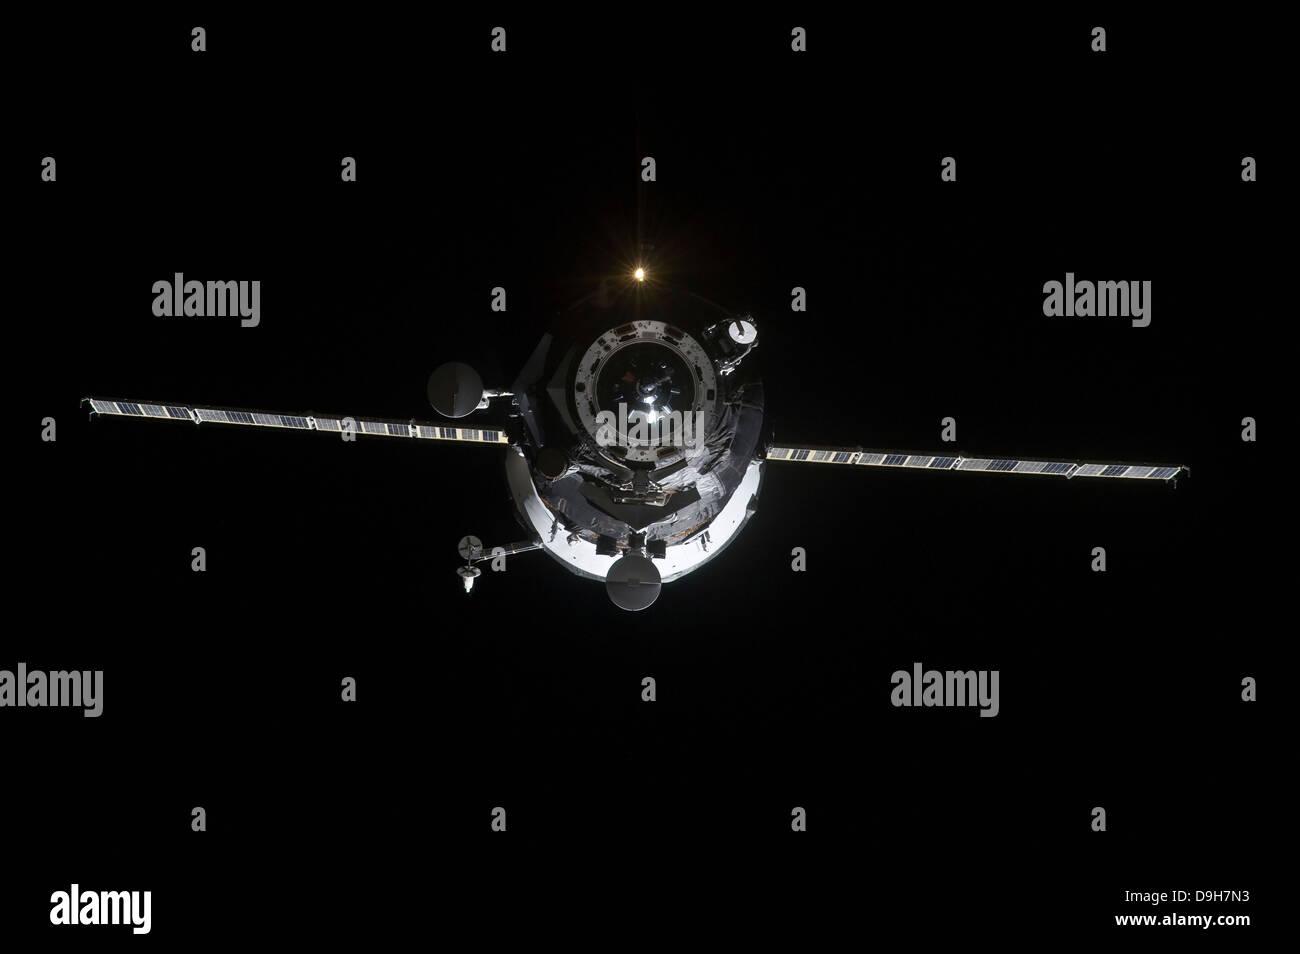 The Progress 41 resupply vehicle in orbit - Stock Image